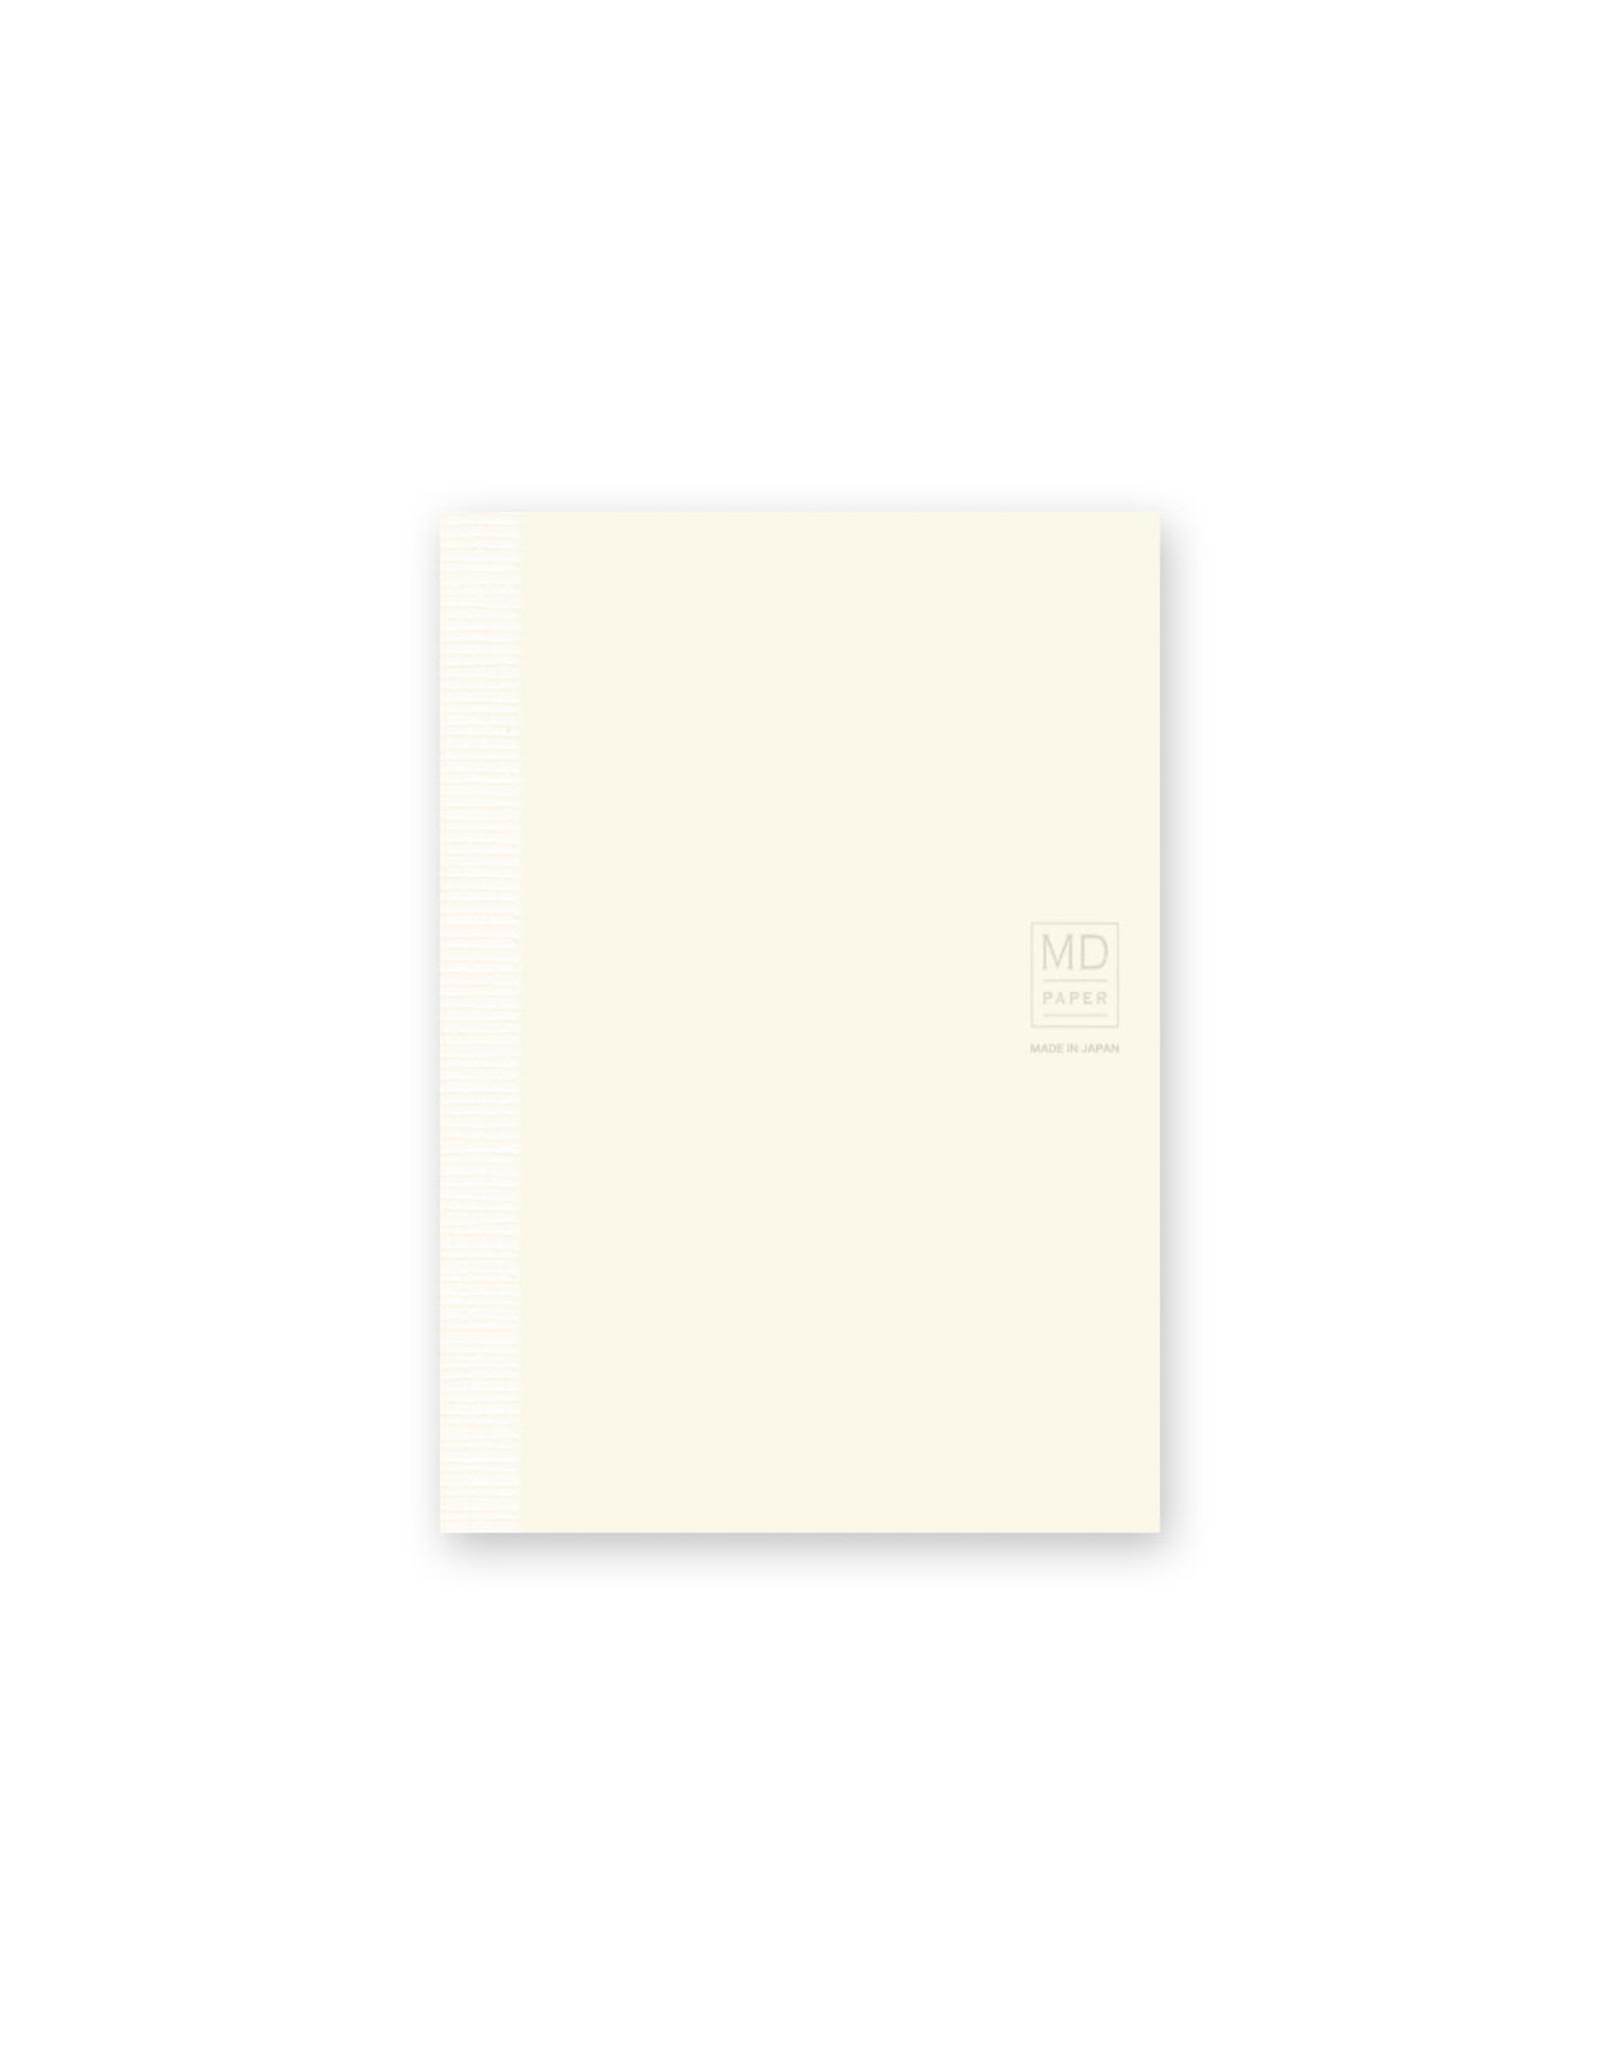 Designphil Inc. MD NOTEBOOK A6 BLANK ENGLISH CAPTION